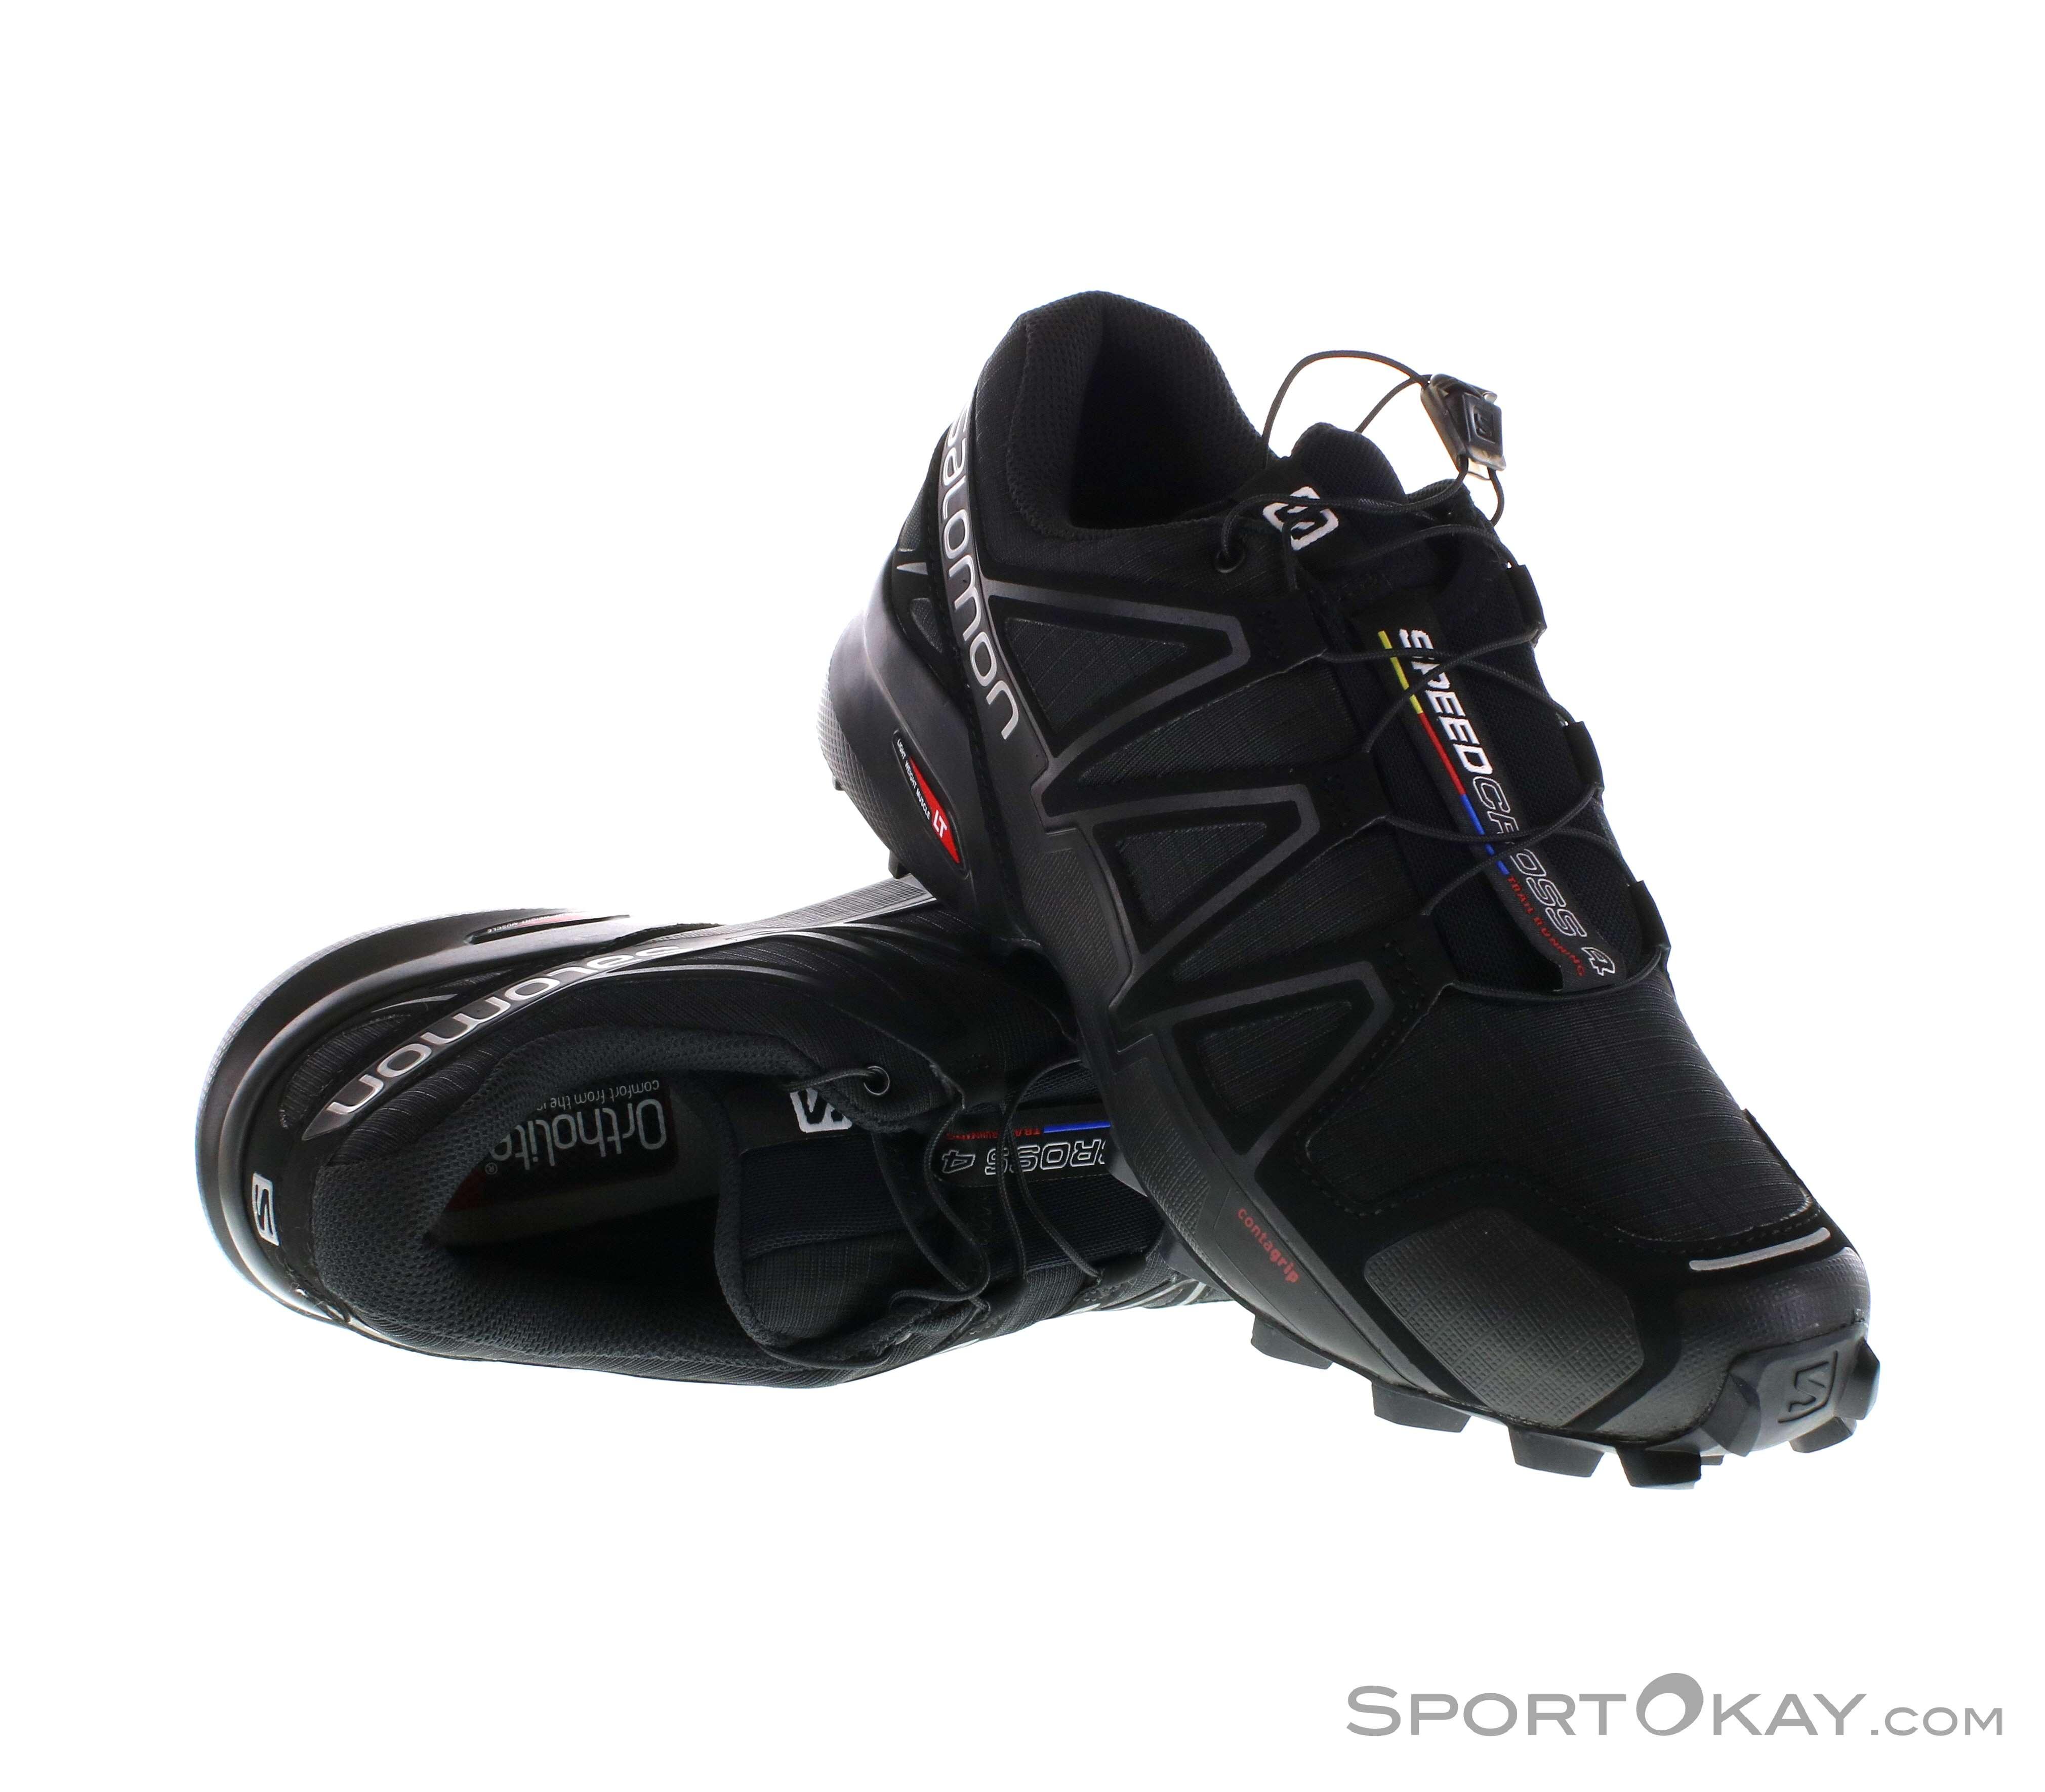 on sale 82d36 1d443 Salomon Salomon Speedcross 4 Herren Traillaufschuhe